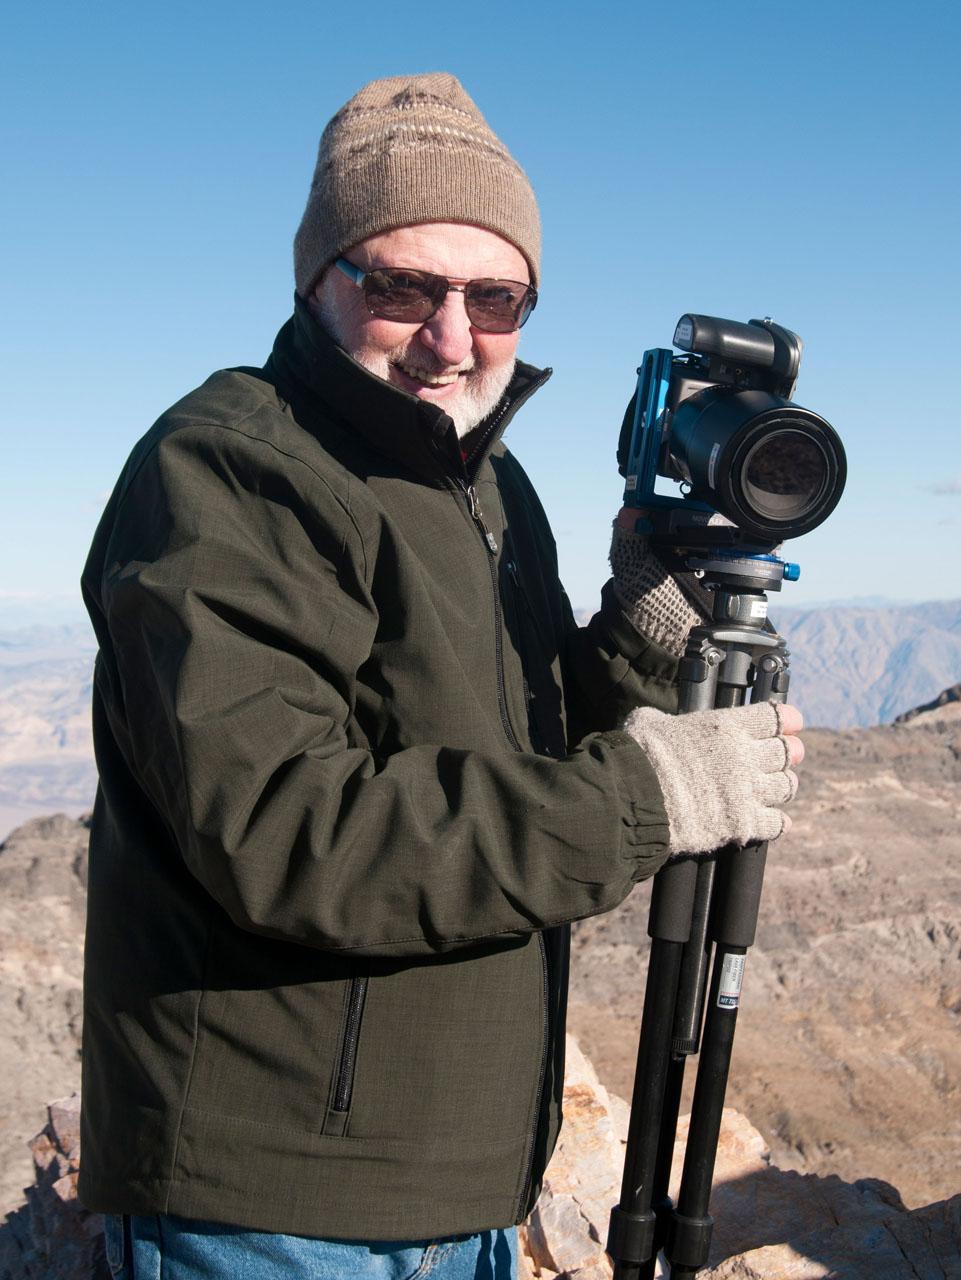 Death_Valley_2012_web_154.jpg